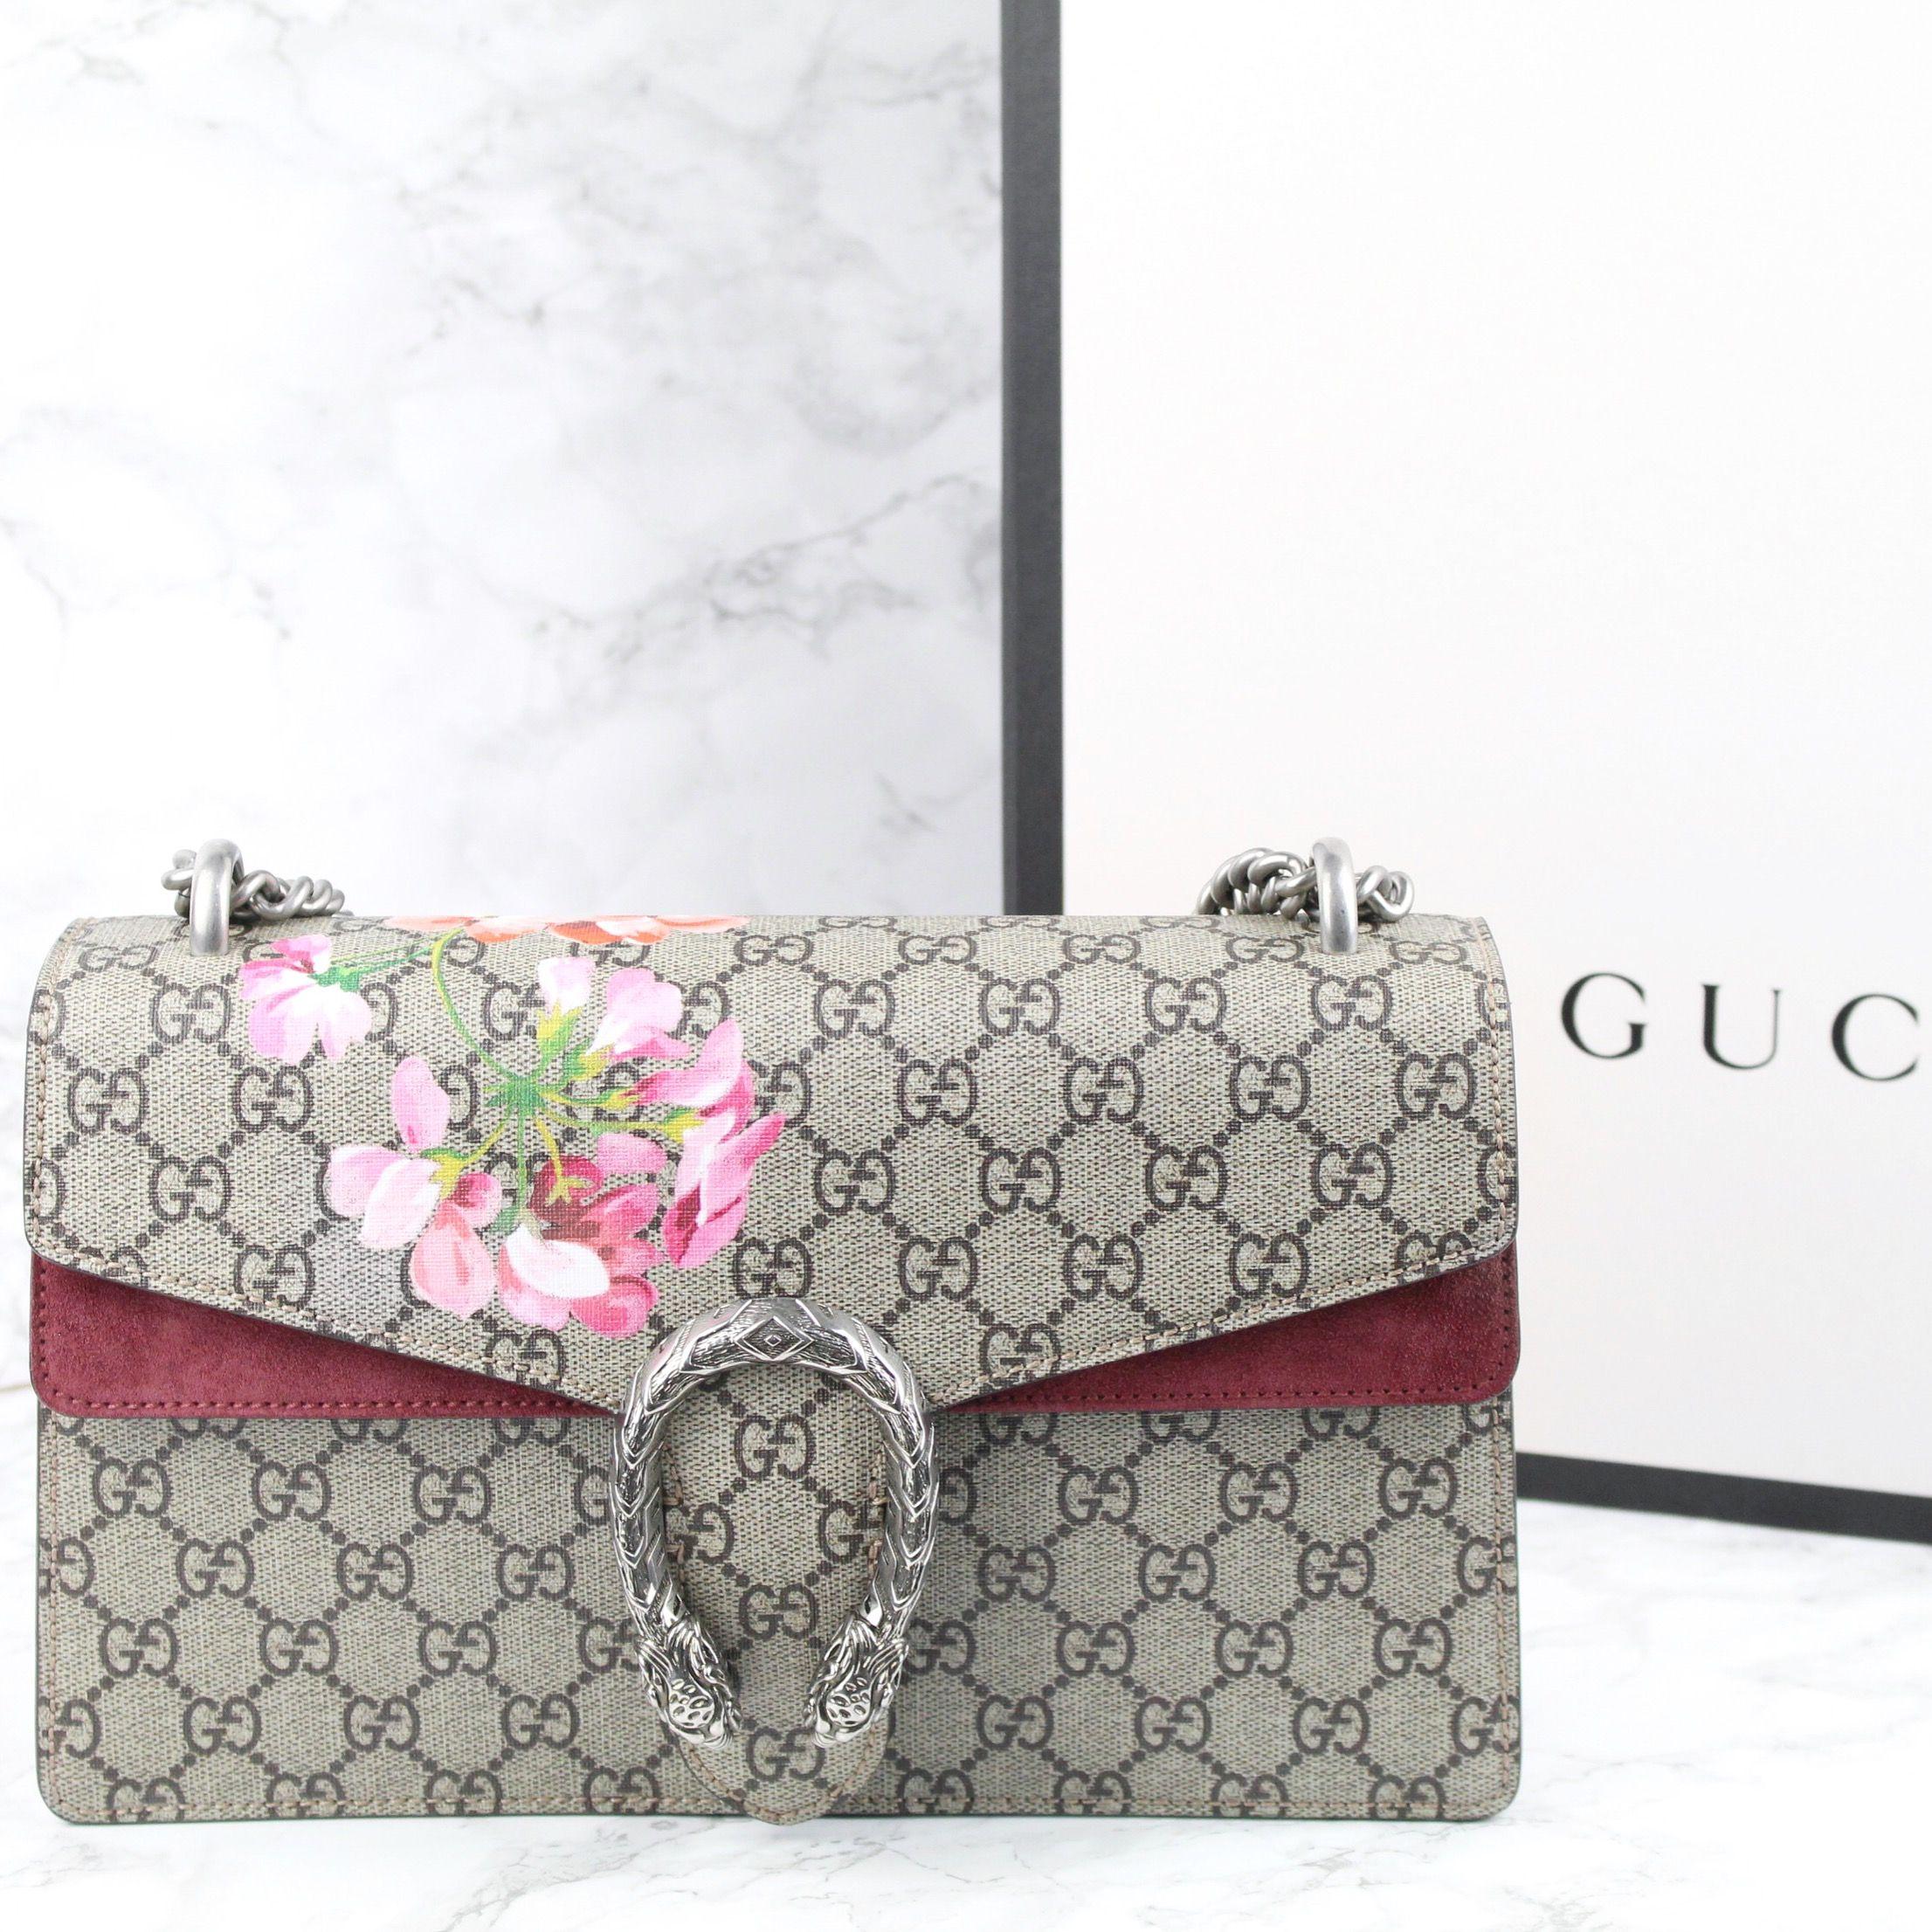 a4b685a99856 Gucci Dionysus Bag with floral print | Gucci Handbags in 2019 ...